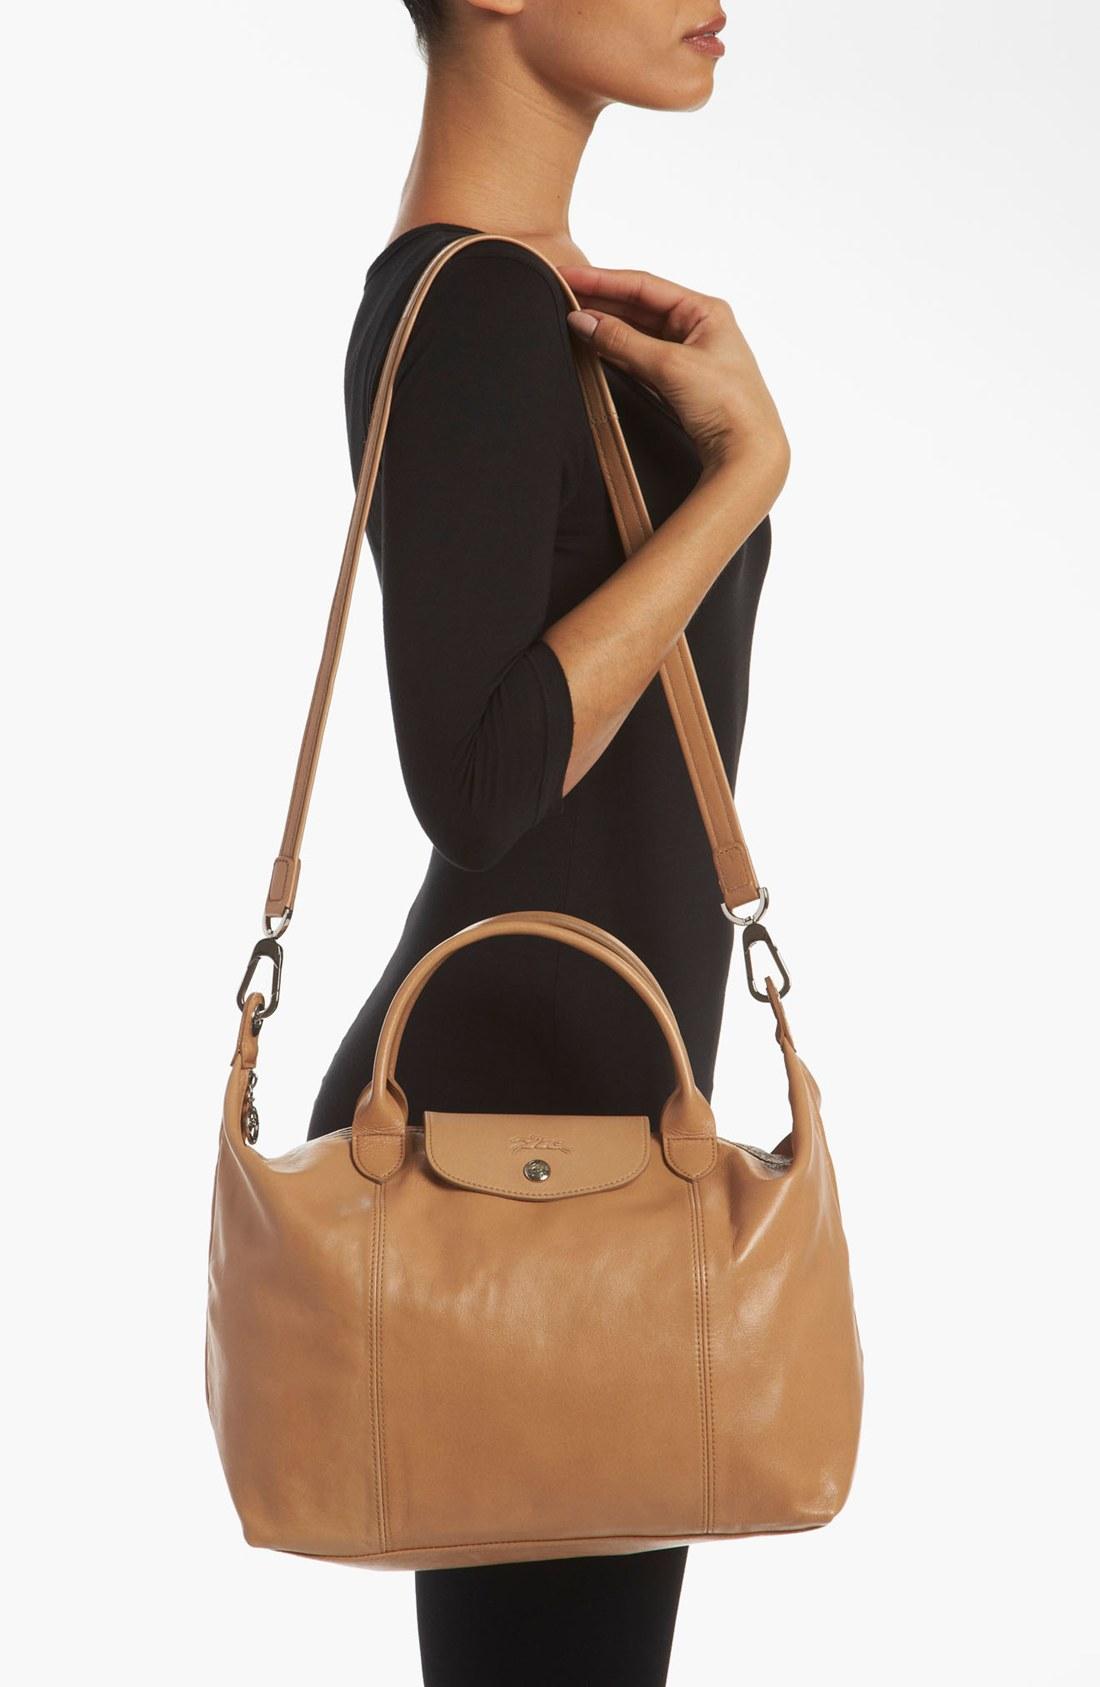 longchamp le pliage cuir leather handbag in orange lyst. Black Bedroom Furniture Sets. Home Design Ideas